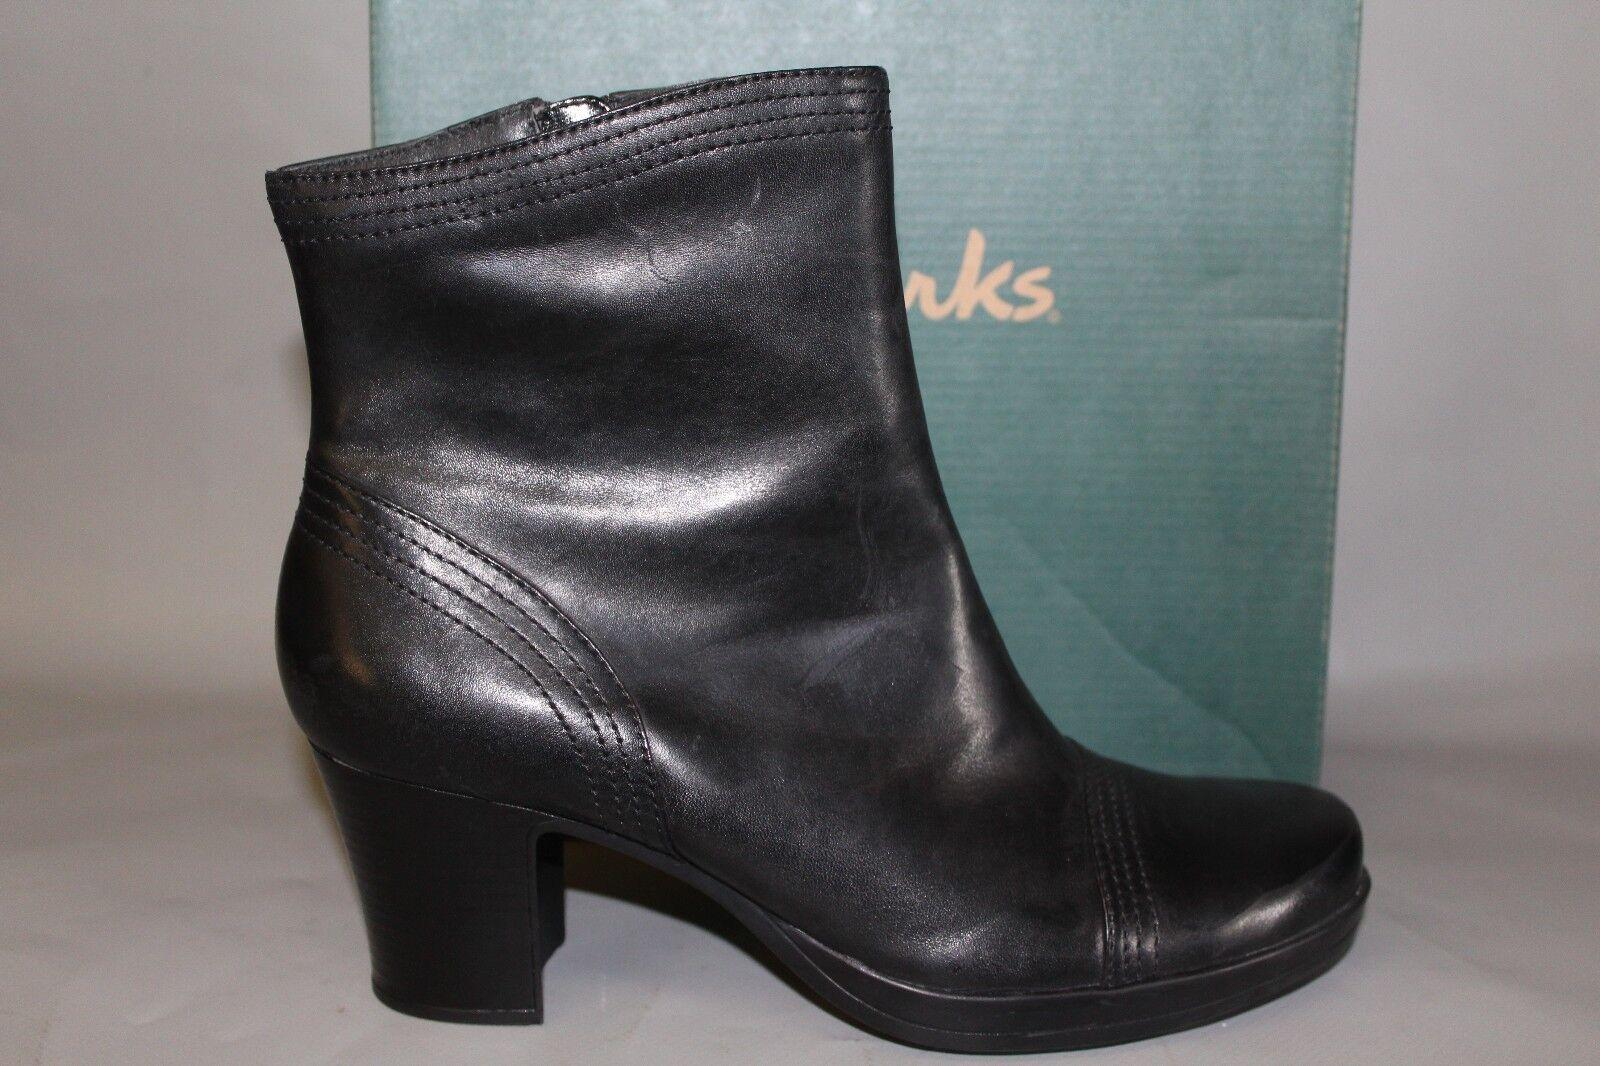 NEW Women's Clarks Toni Size 8.5 Medium Black Leather Dress Boots